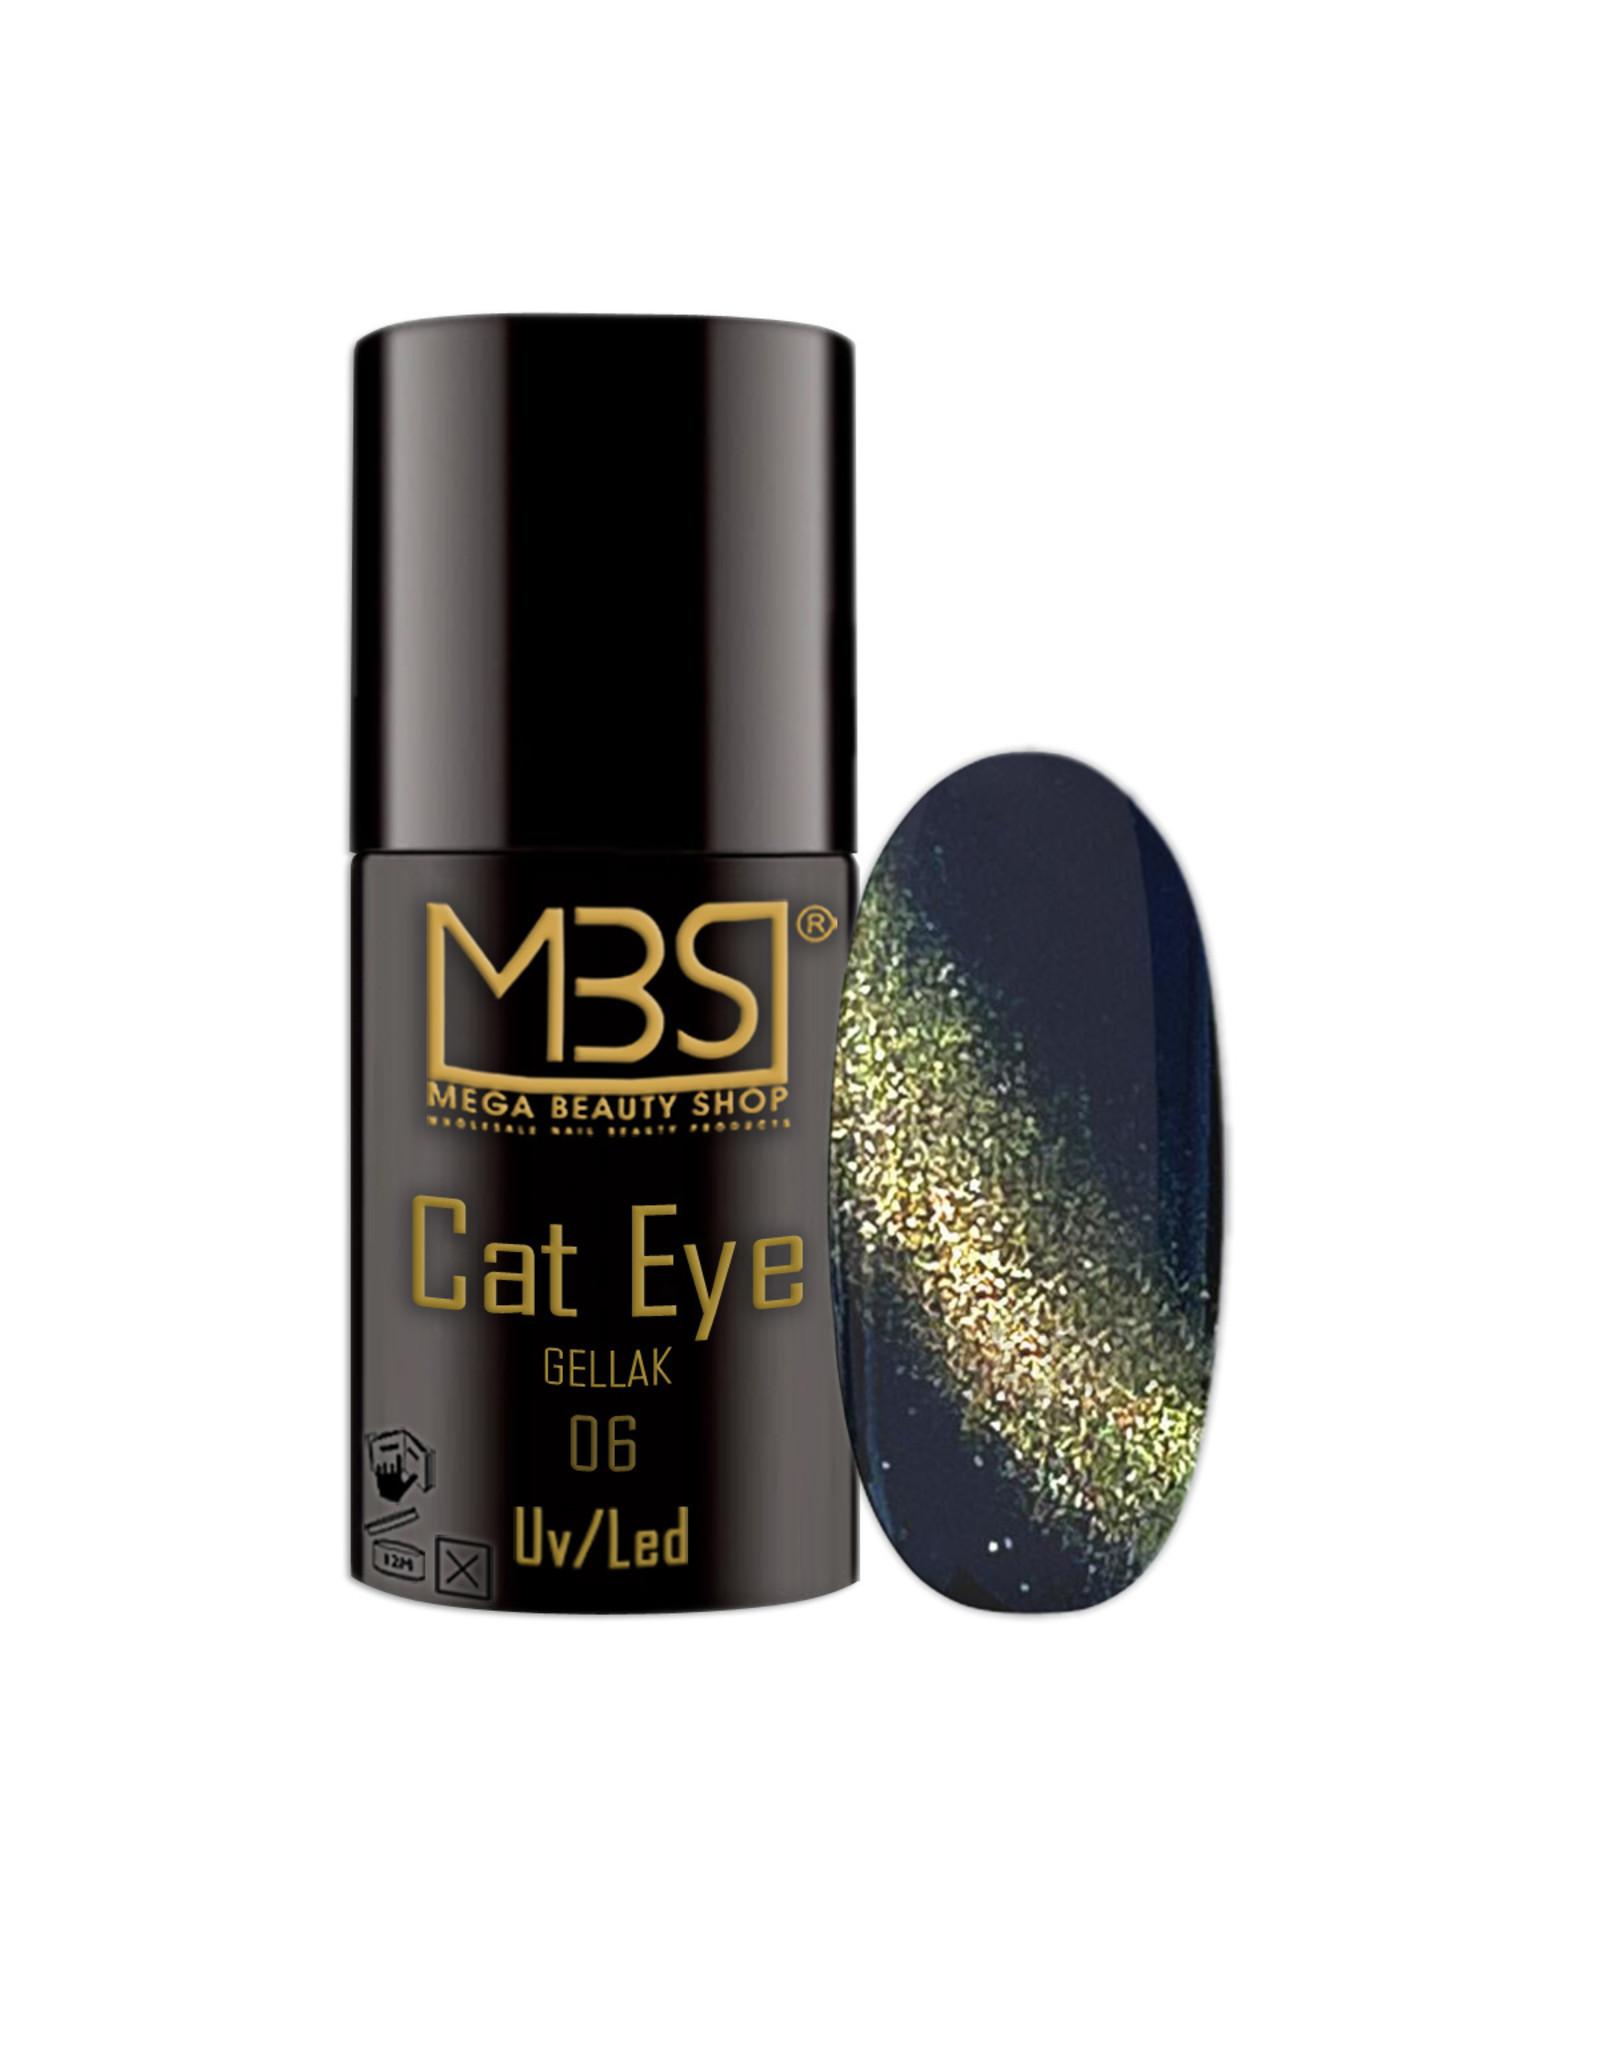 Mega Beauty Shop® Cat Eye Gellak (06)